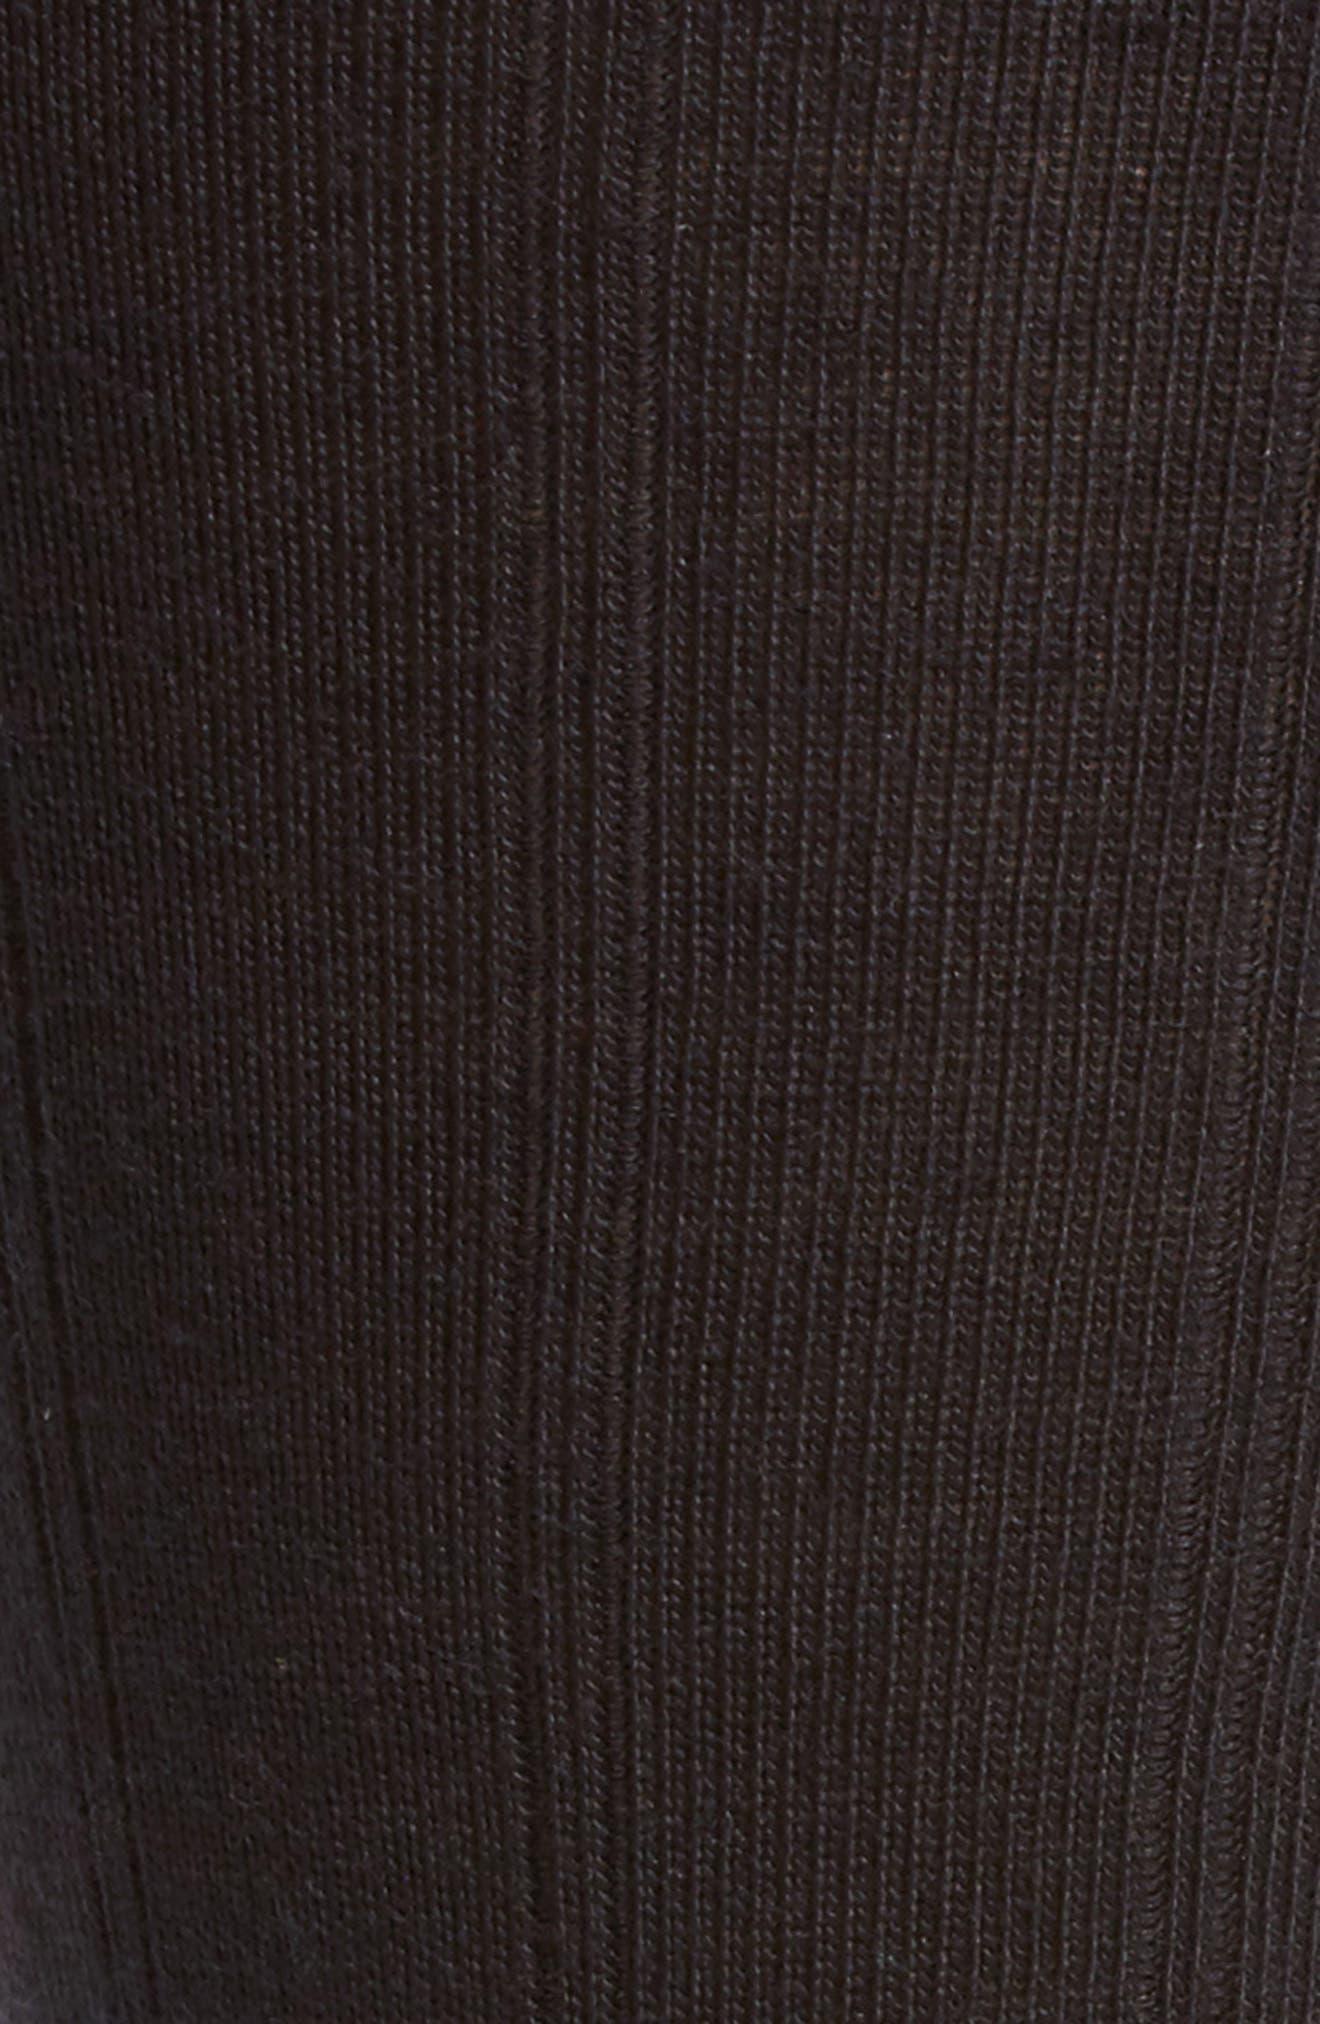 a14e07498142 Men s Nordstrom Men s Shop Clothing